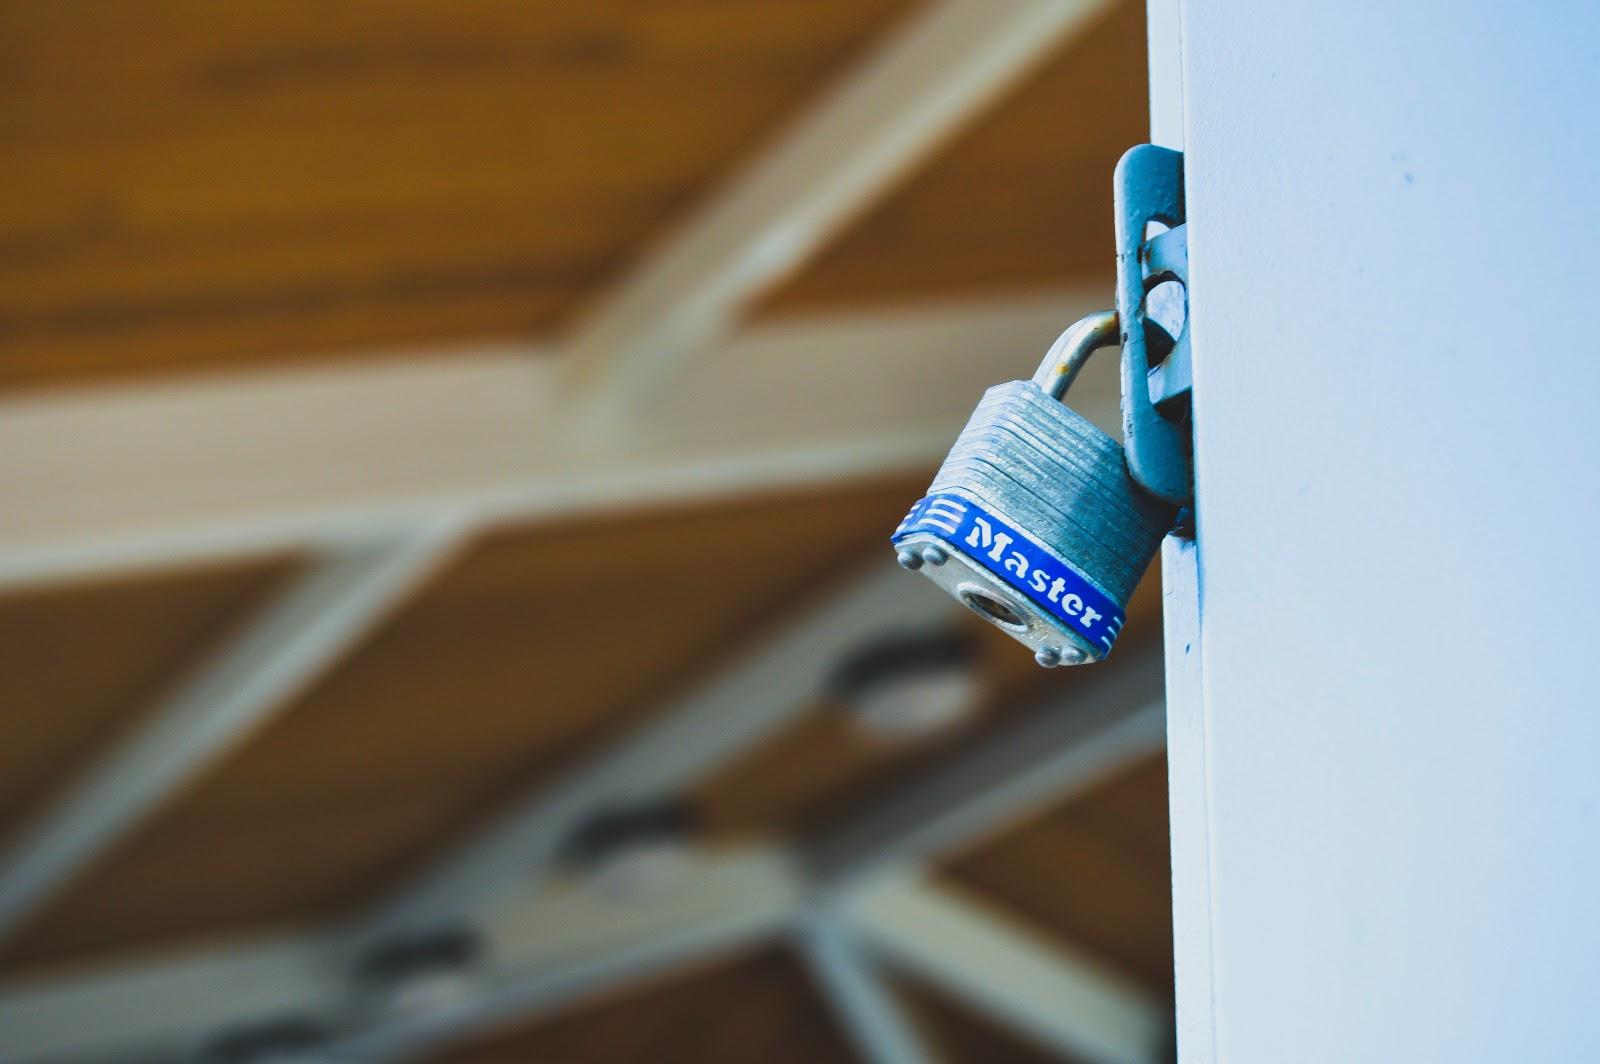 A metal lock is shut on a large door